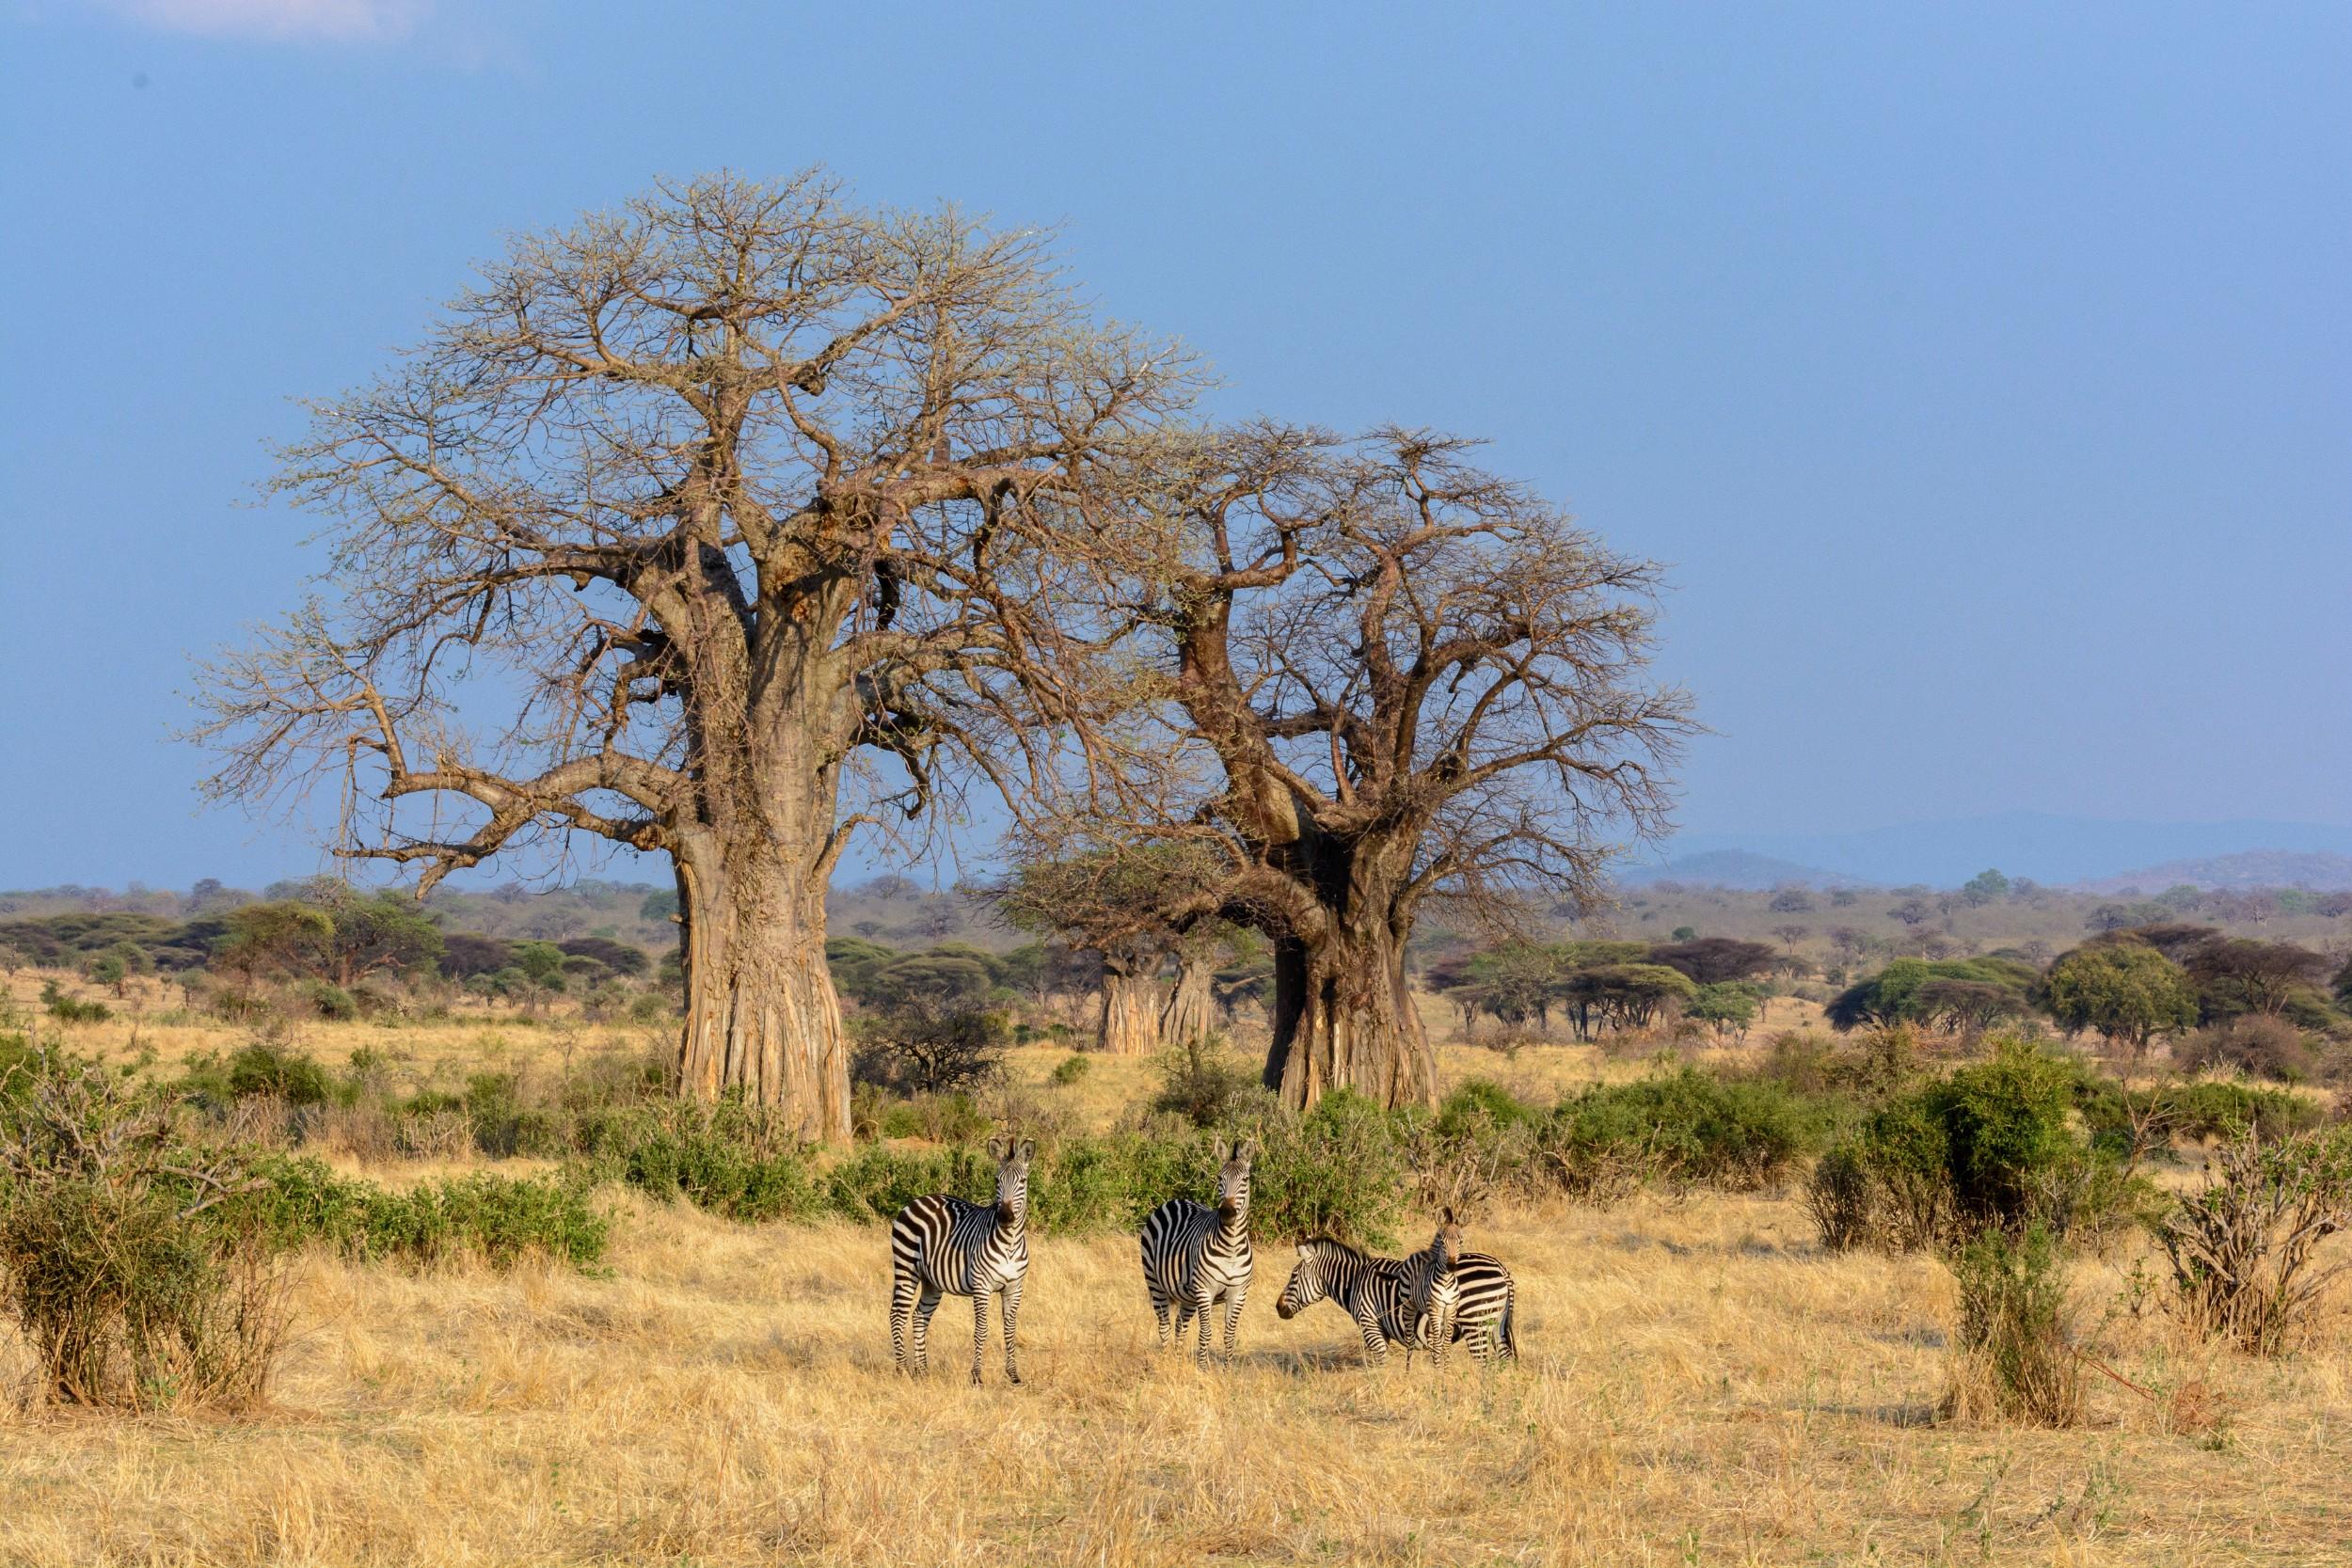 Jabali-Ridge-landscape-baobab-tree-zebra.jpg